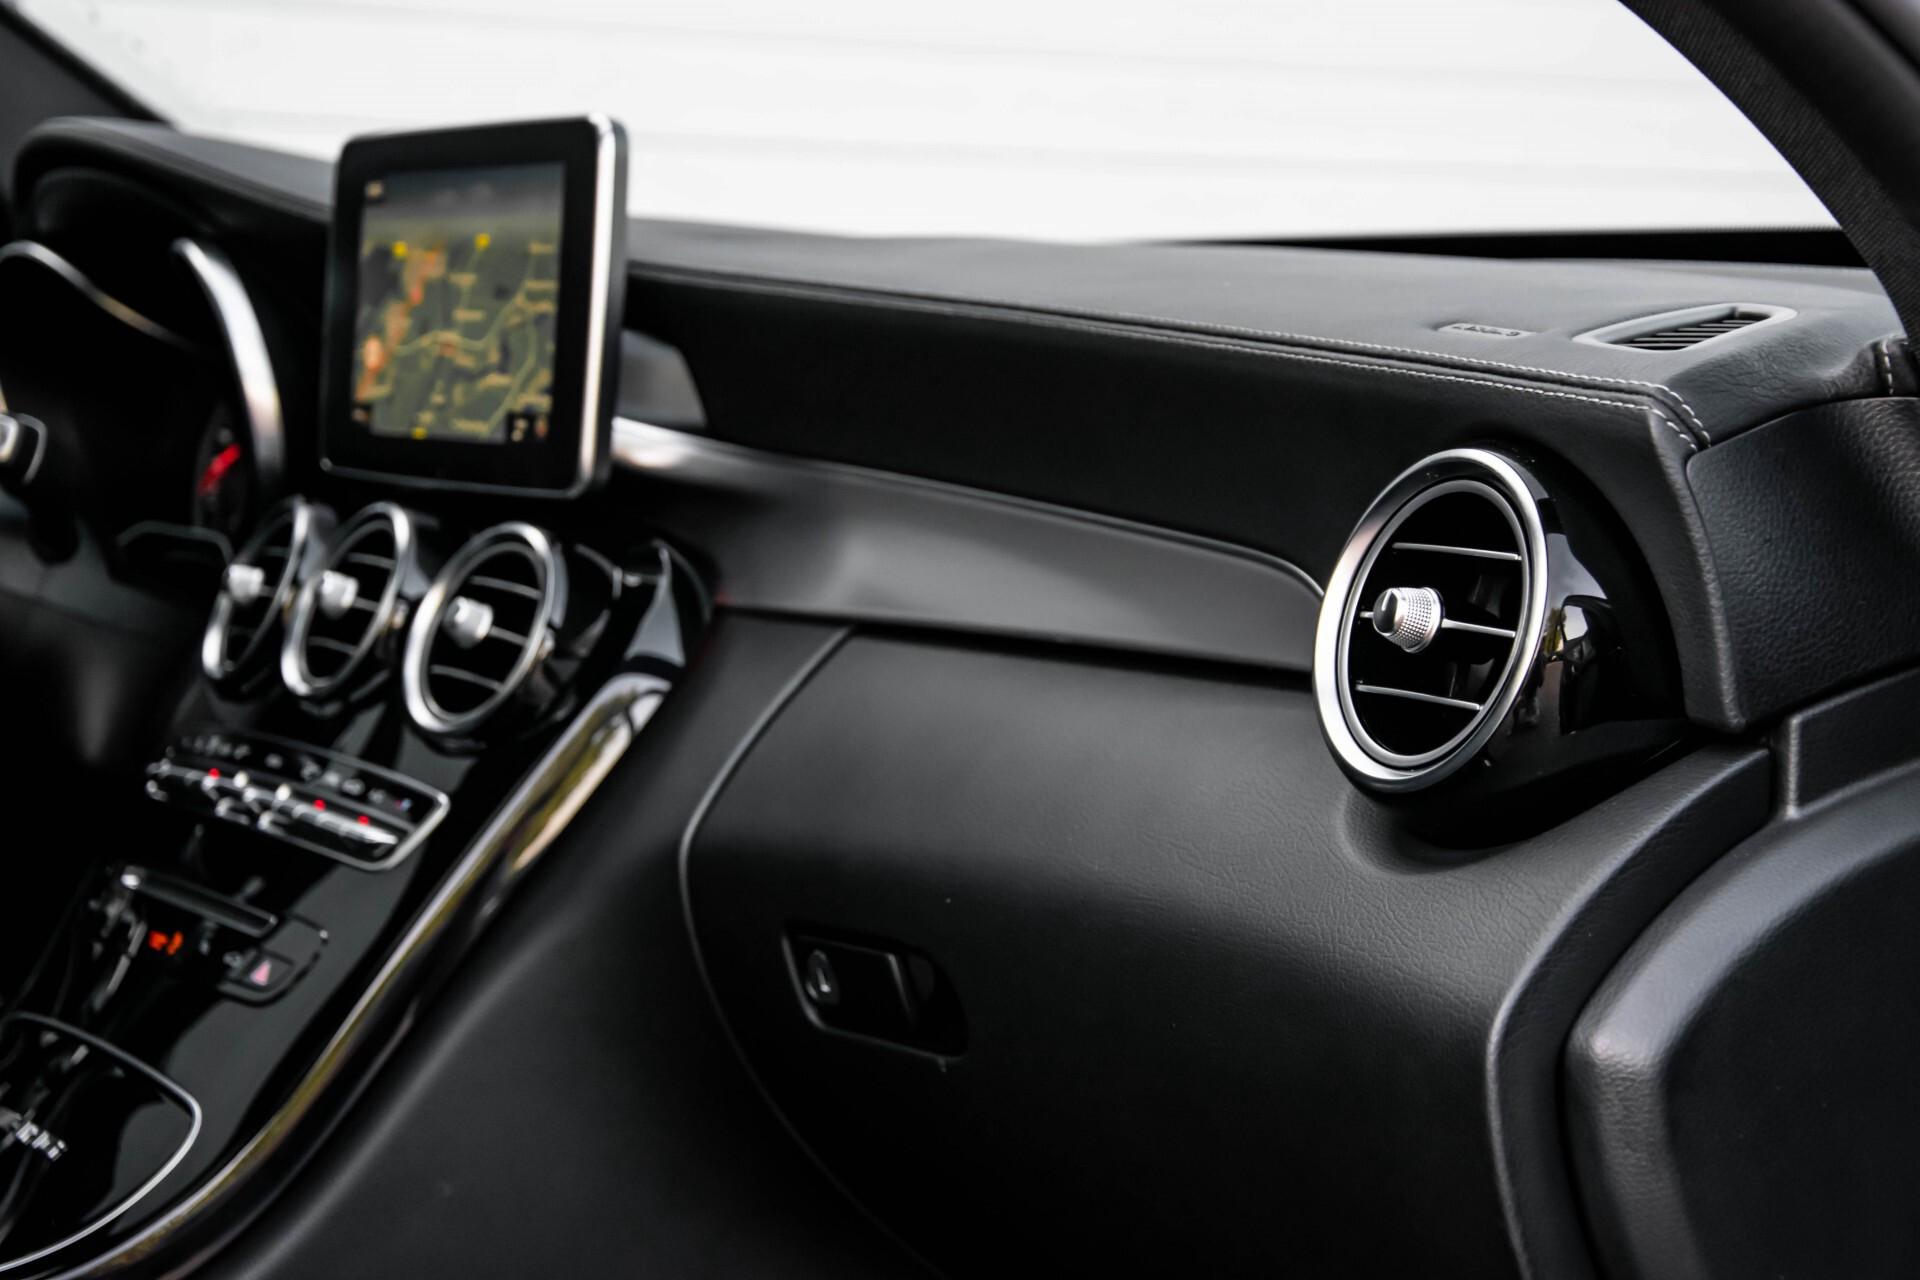 Mercedes-Benz C-Klasse 63 AMG S Panorama/Distronic/Keyless/Comand/Camera/ILS Aut7 Foto 38